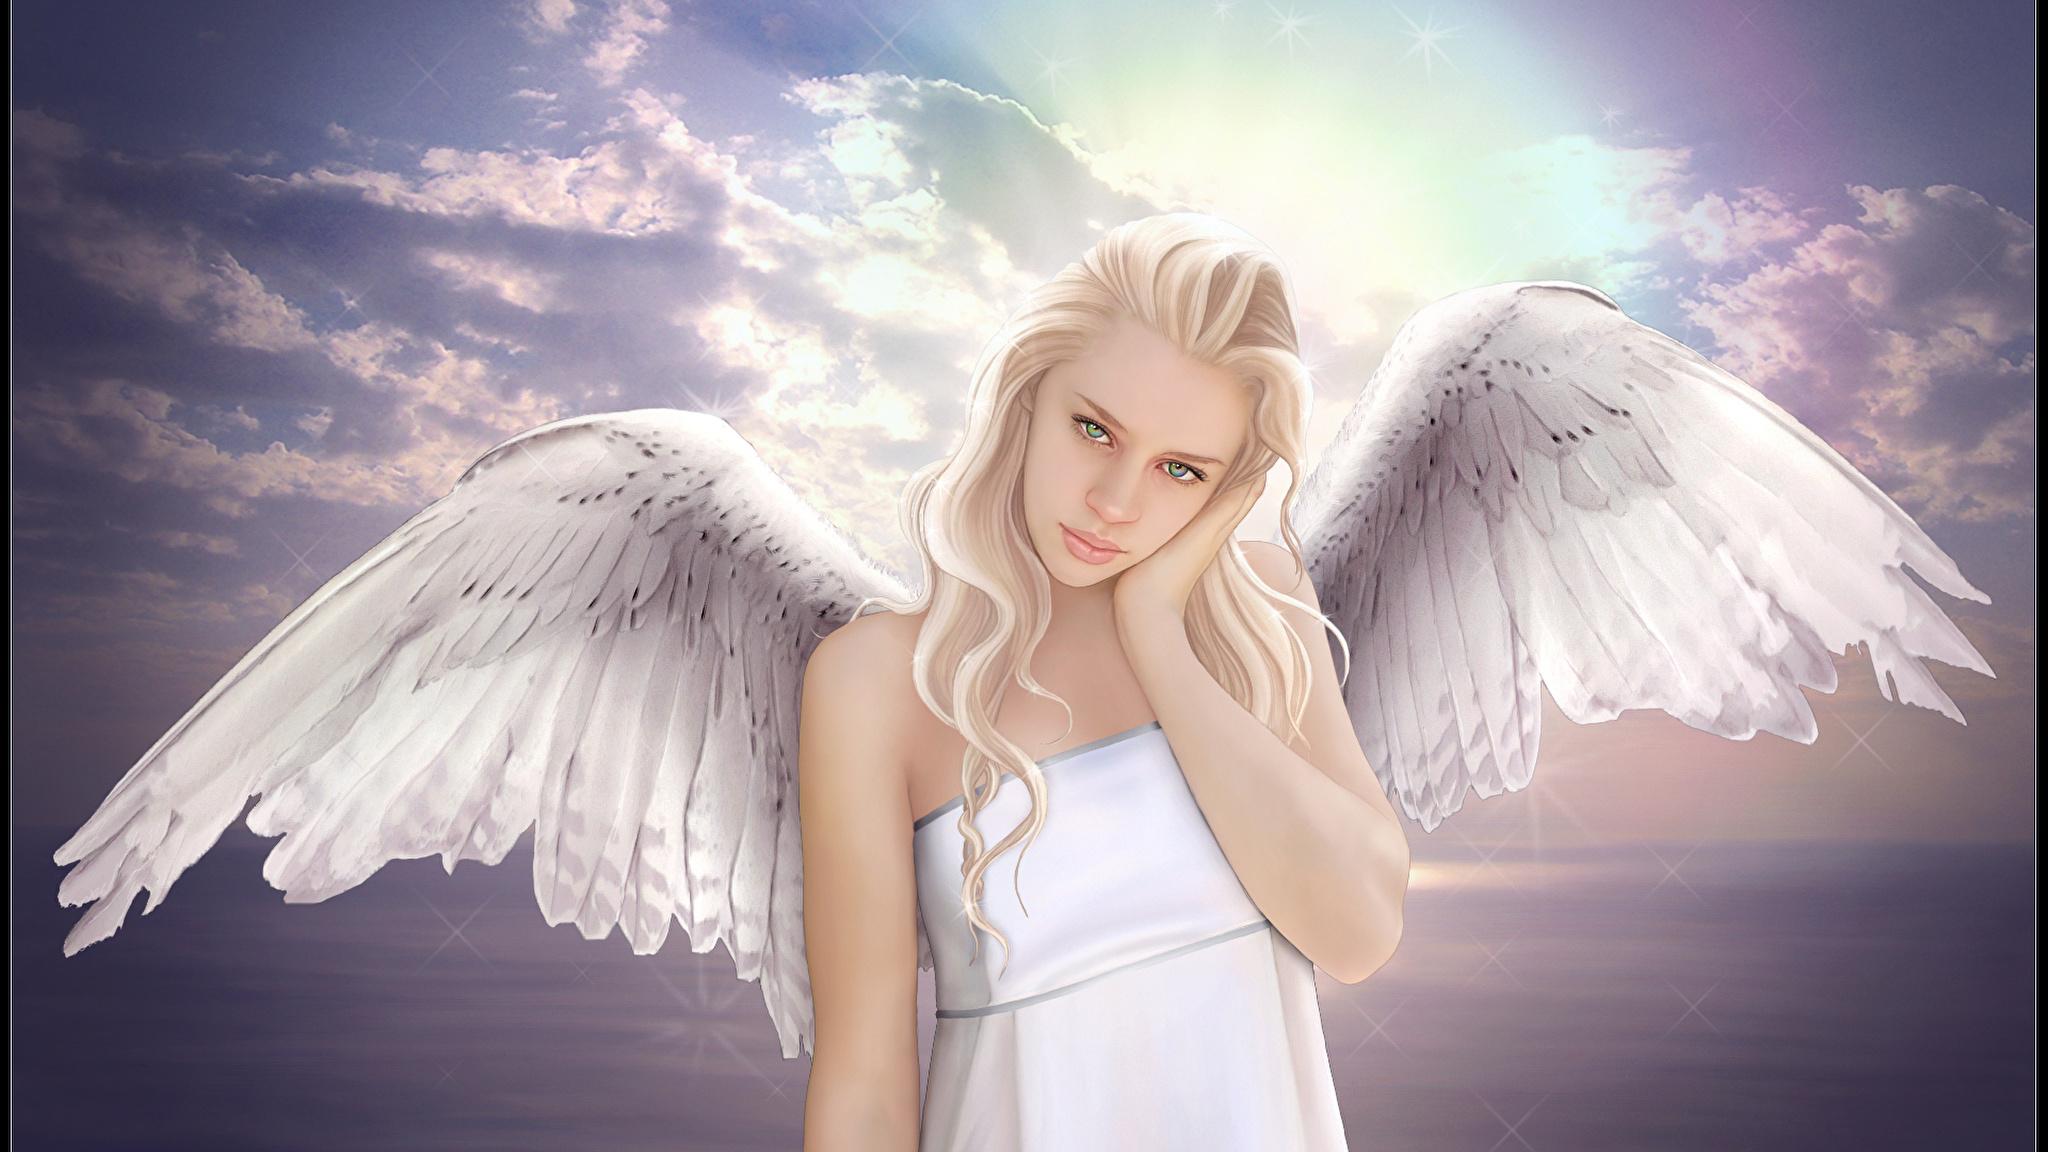 Обои На Телефон Ангелы